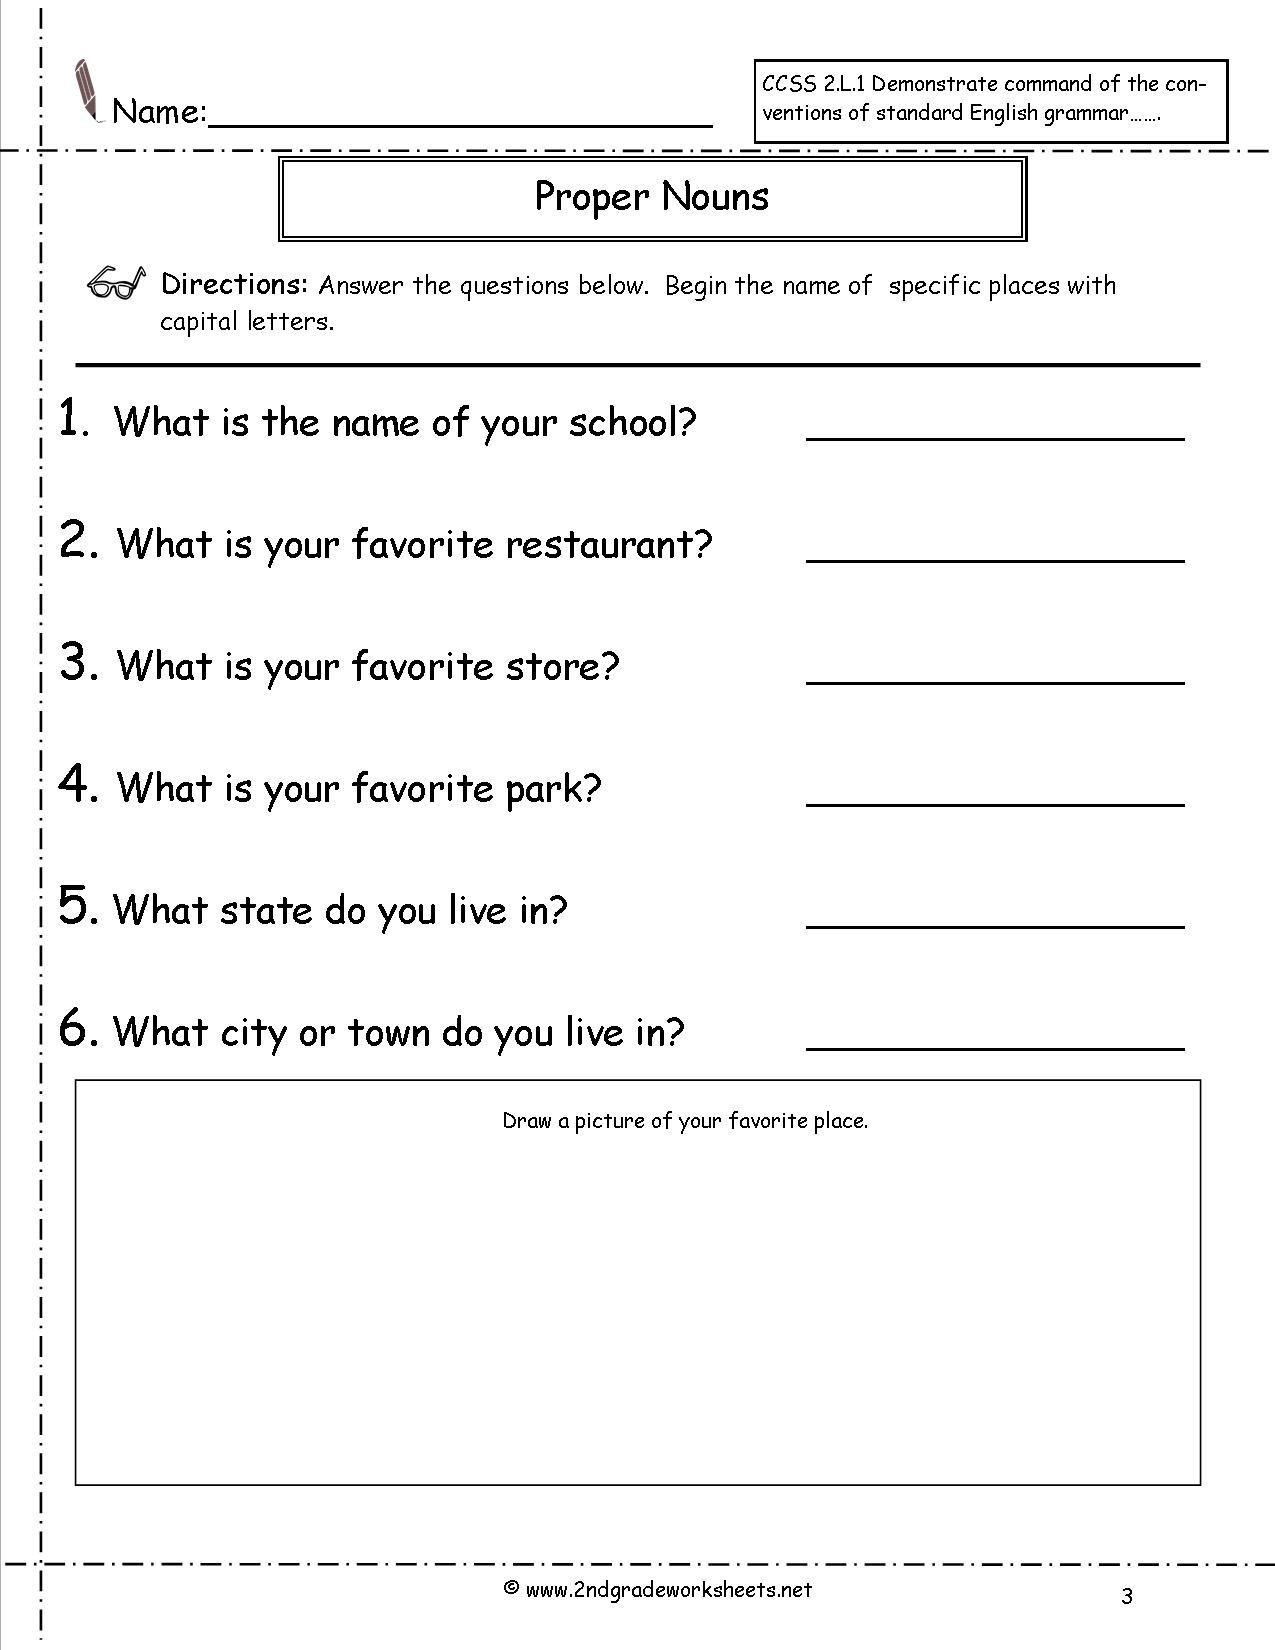 20 Proper Nouns Worksheet 2nd Grade